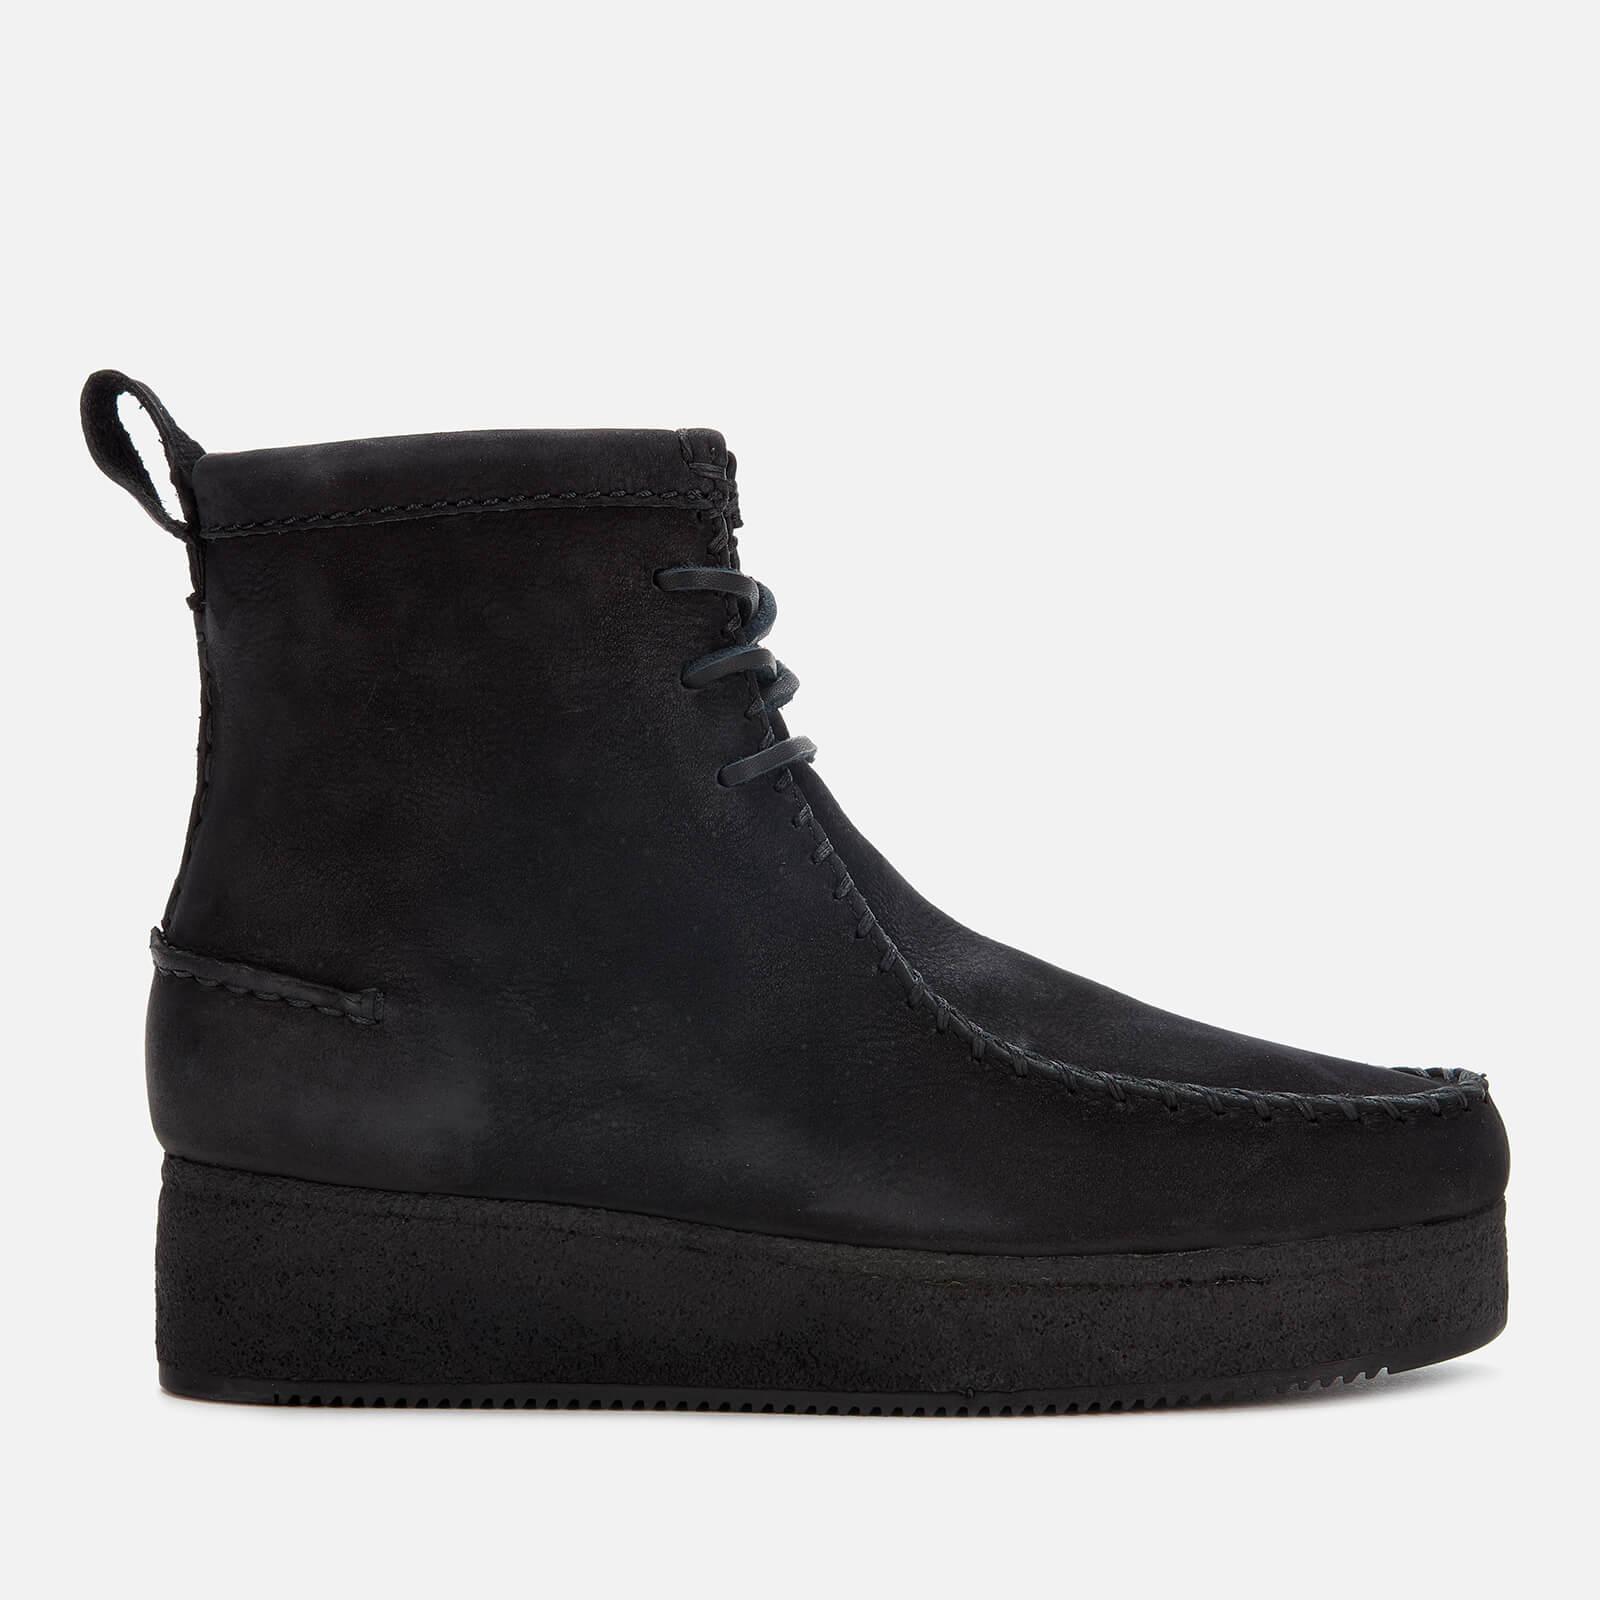 Wallabee Craft Nubuck Boots - Black